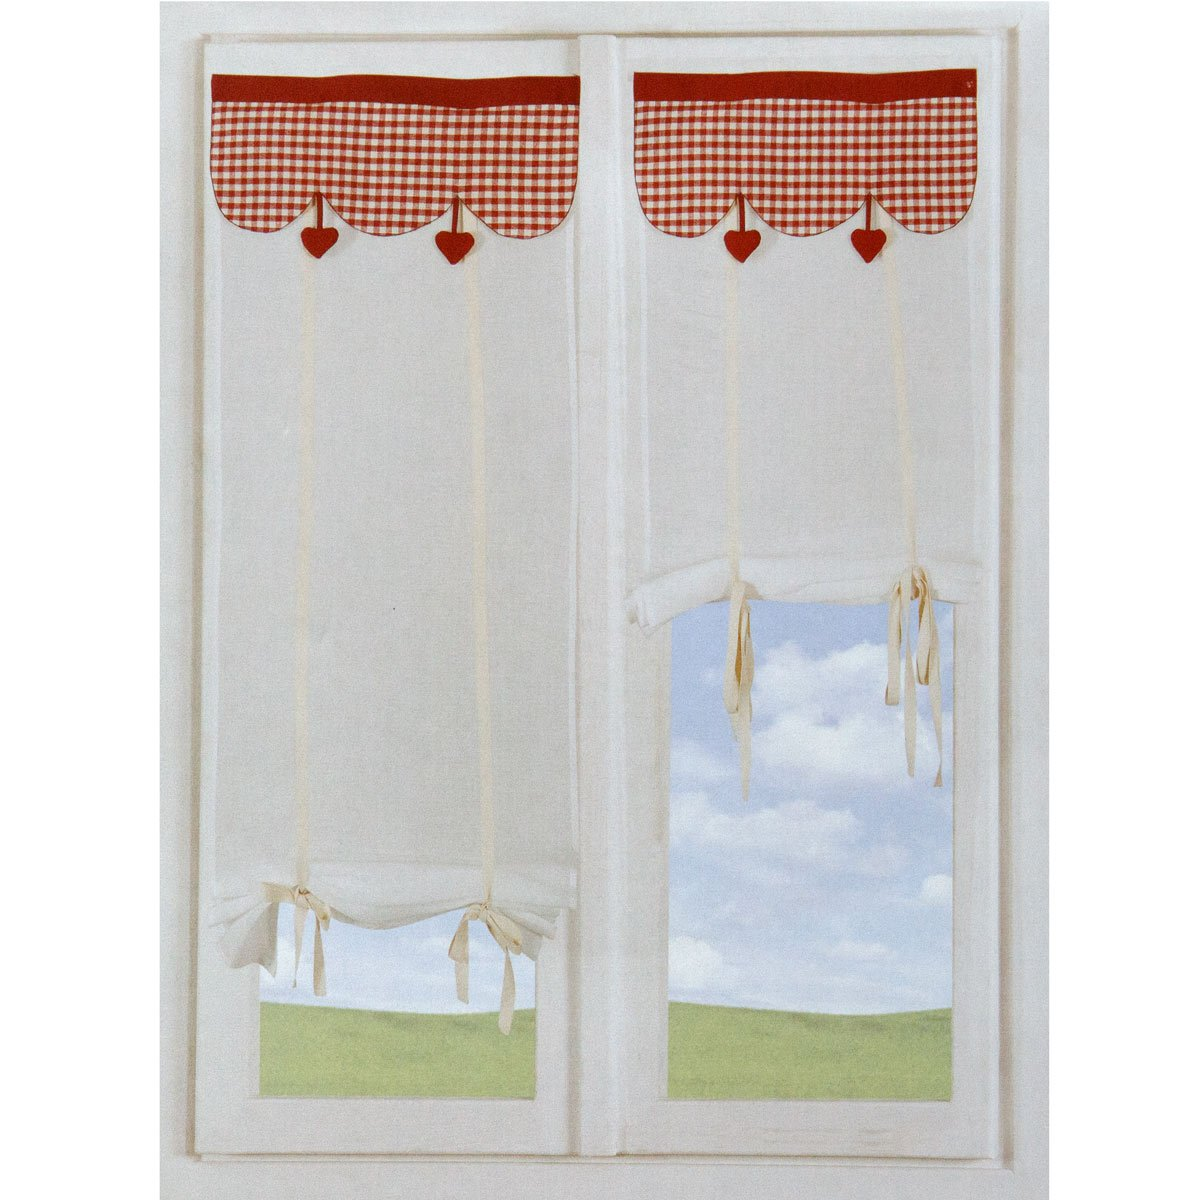 Coppia Tende tendine regolabili vetro finestra 60x150 cm Wendy M377 ...